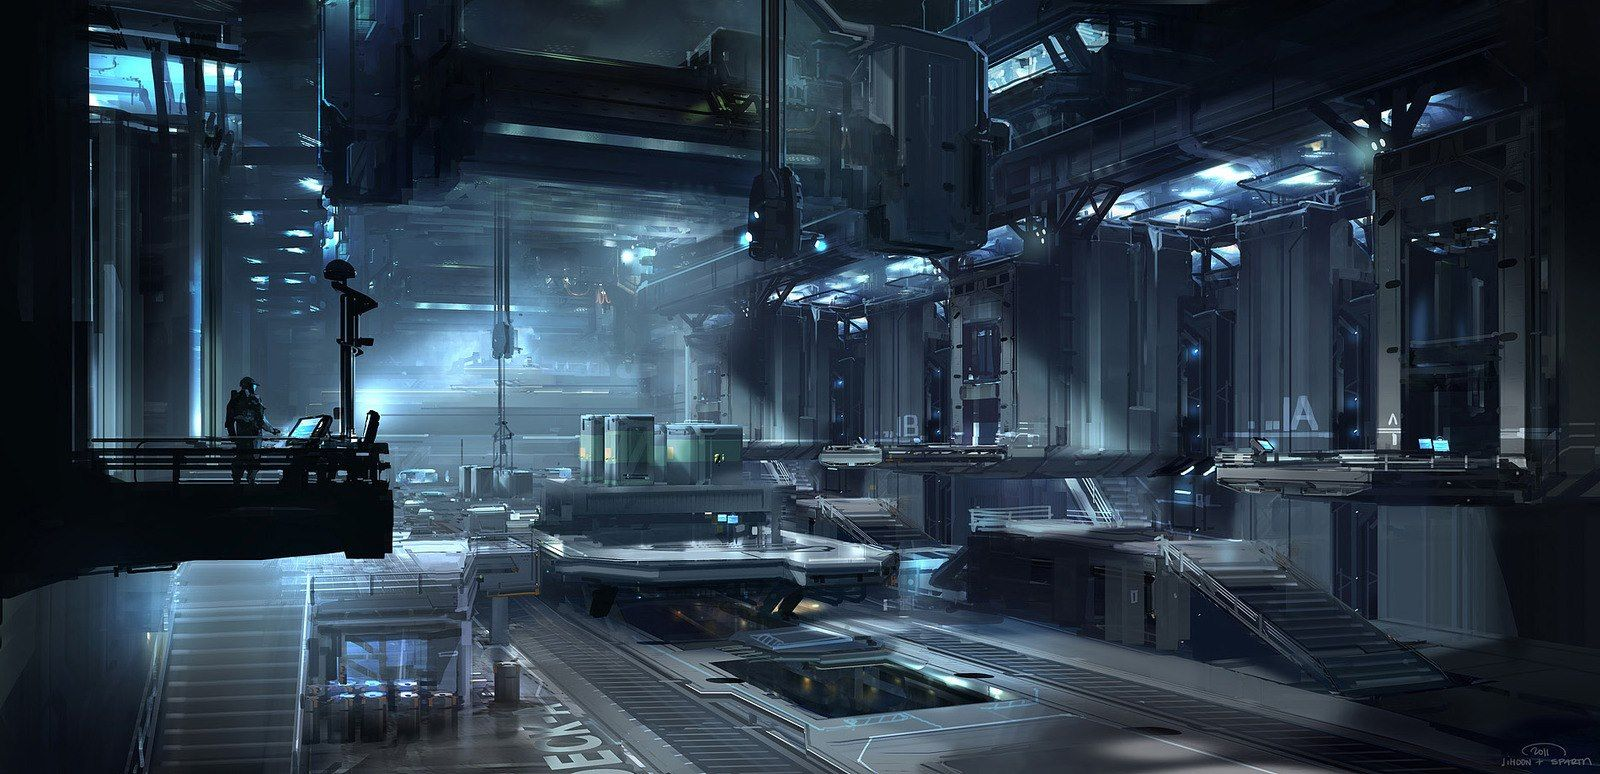 Environment Art of Halo 4 | HaloFanForLife